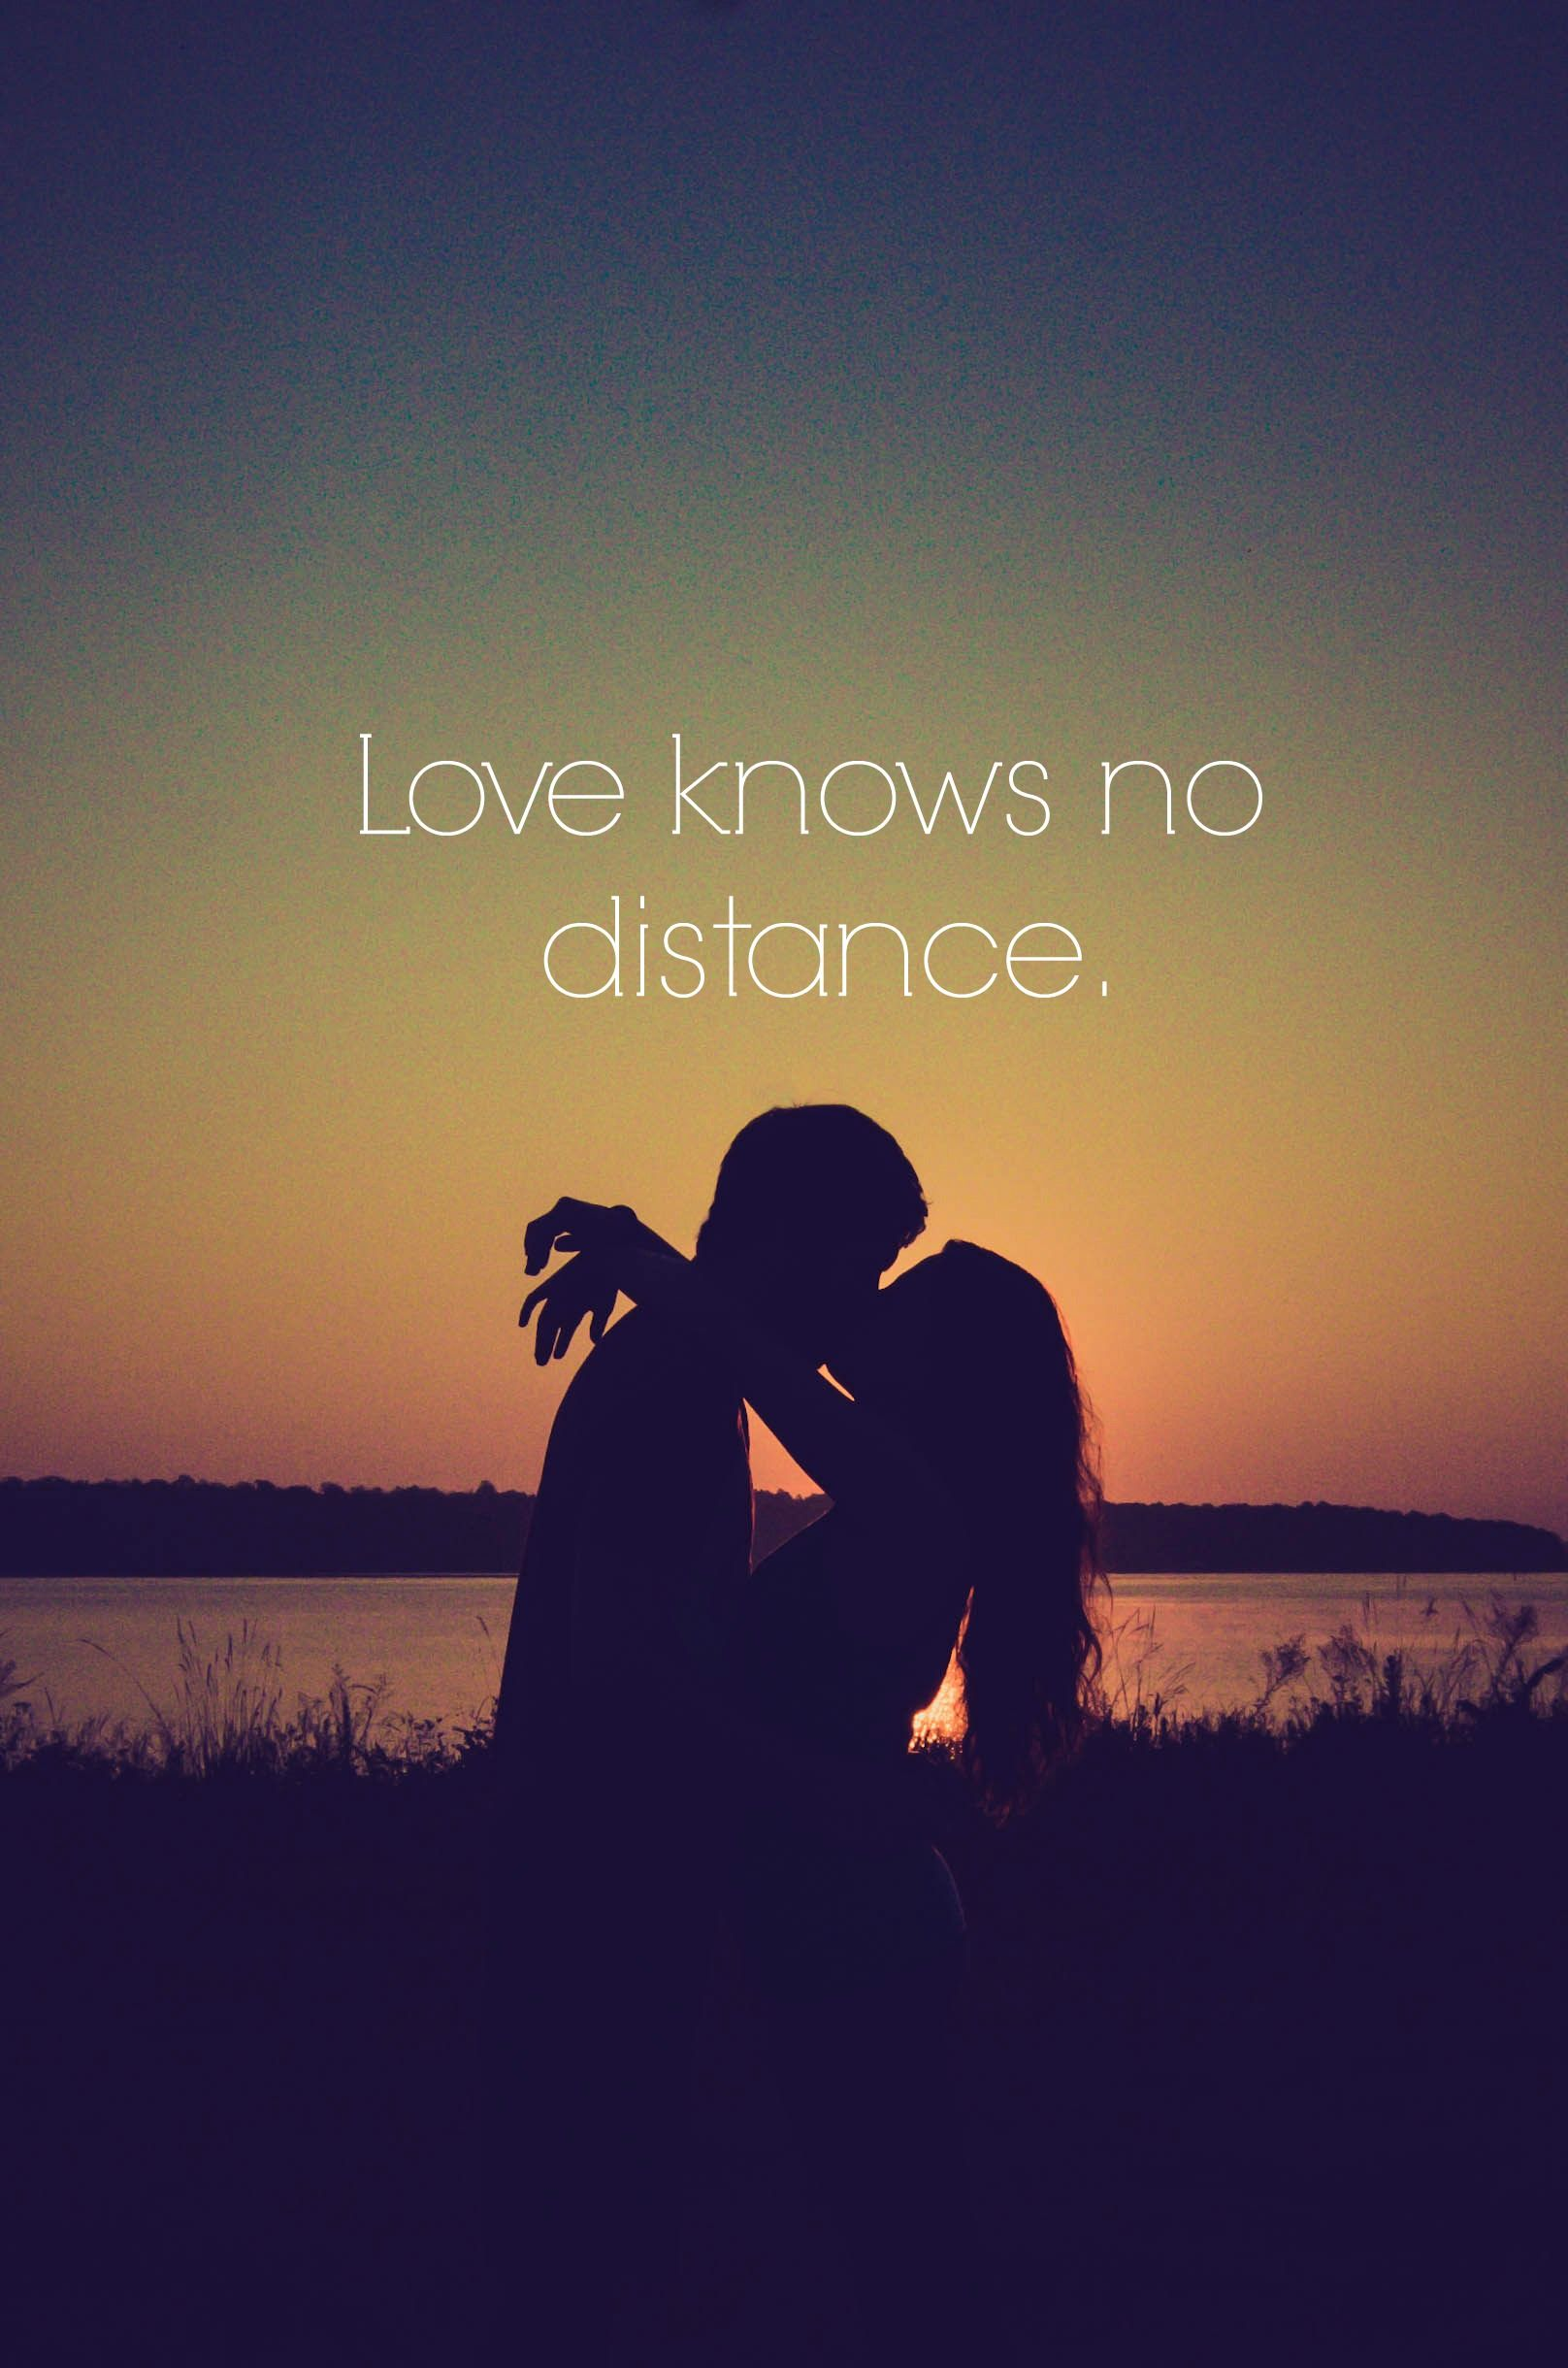 Long Distance Love Quotes Kisses | Wallpaper Image Photo